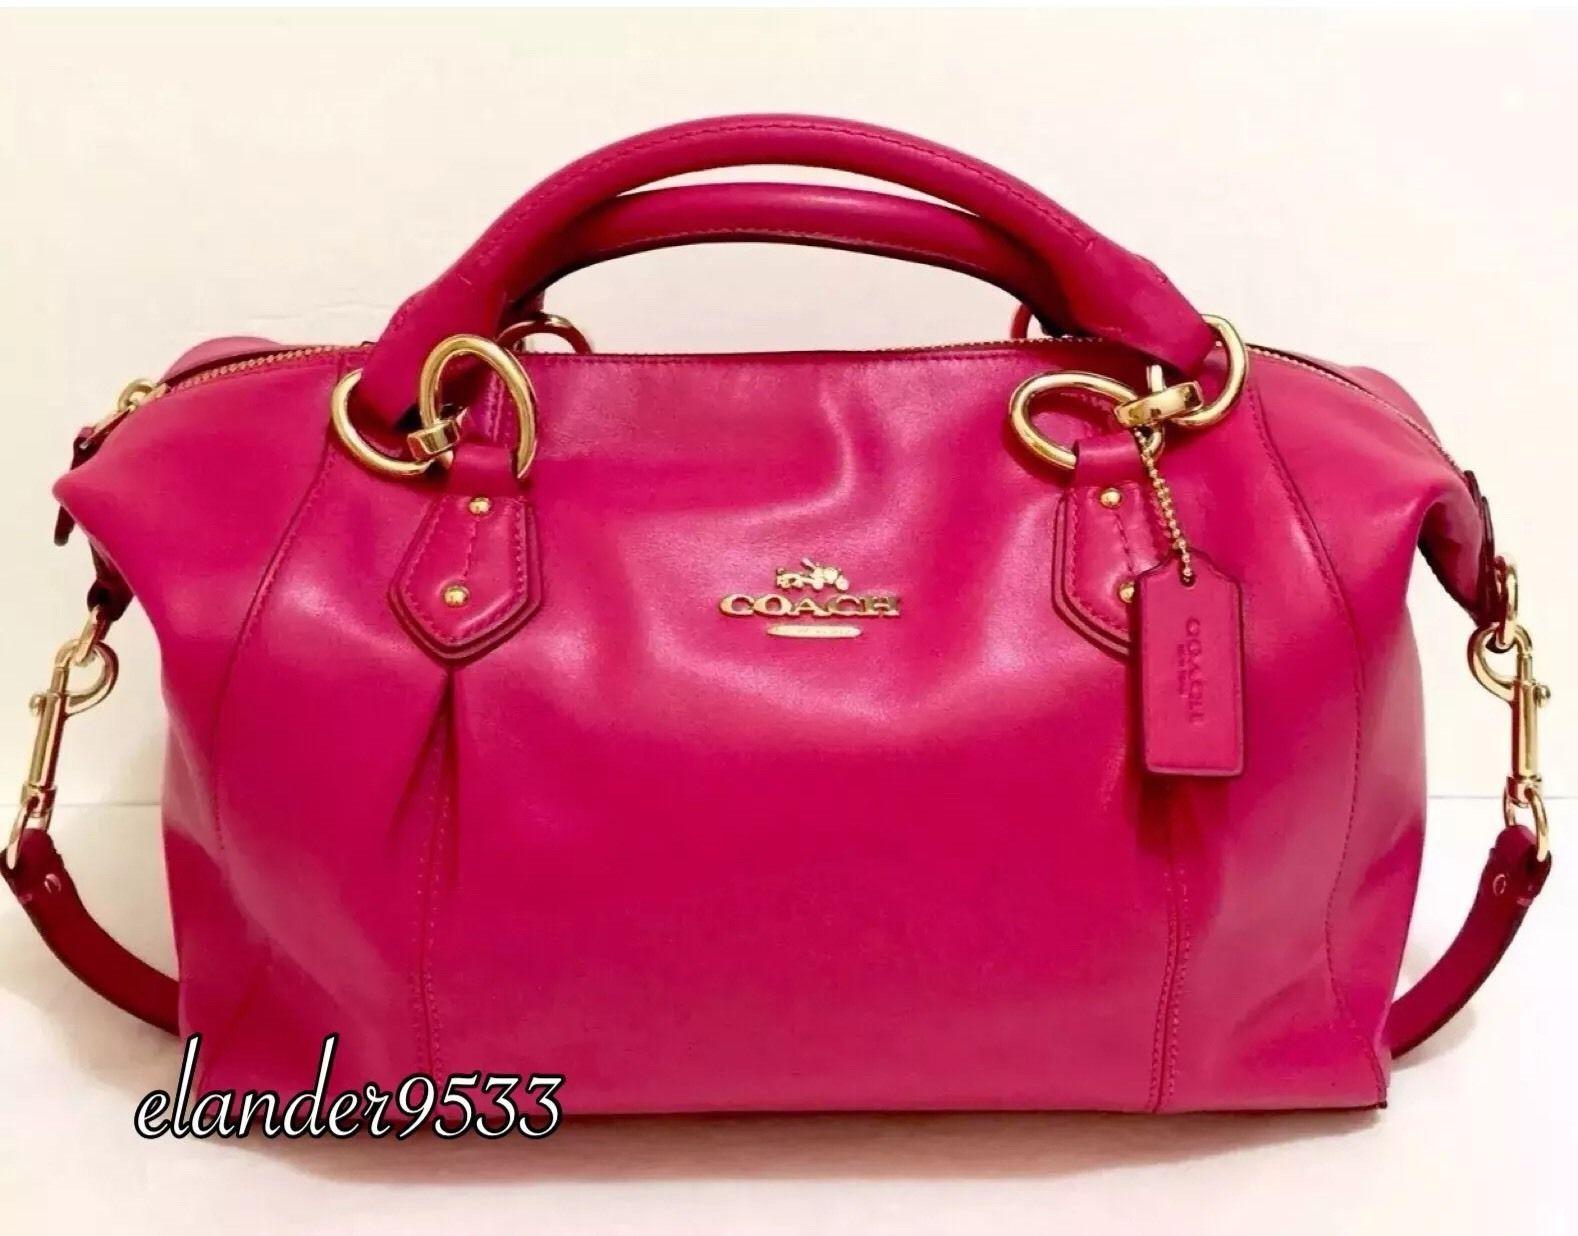 a790cd384c New COACH F33806 Colette Leather Satchel Shoulder Bag Purse Handbag Pink  Ruby  169.95